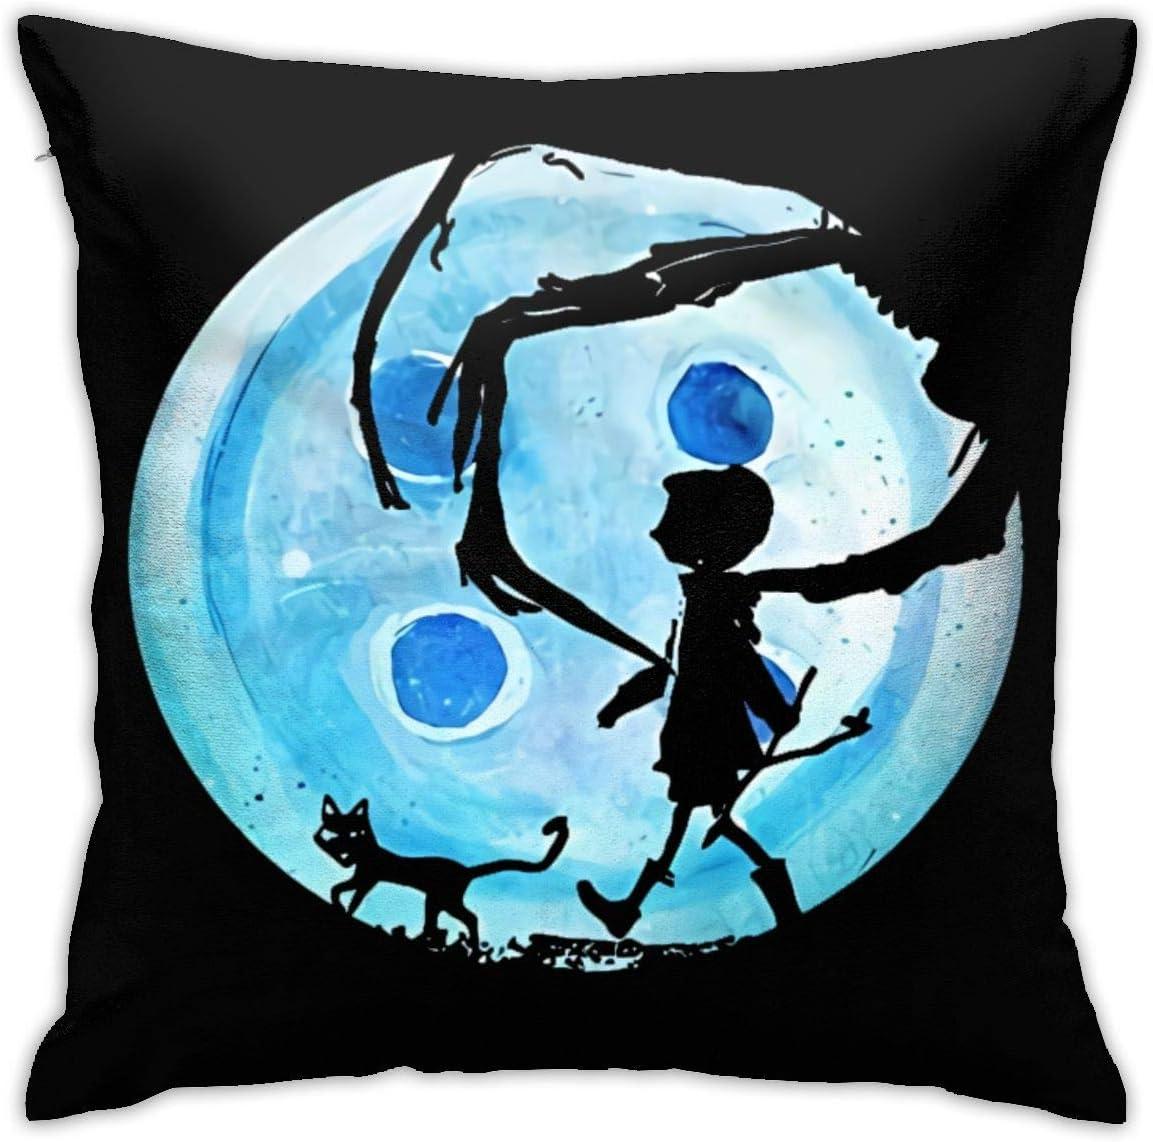 Made In USA Fast Shipping Coraline Cartoon  Fleece Blanket